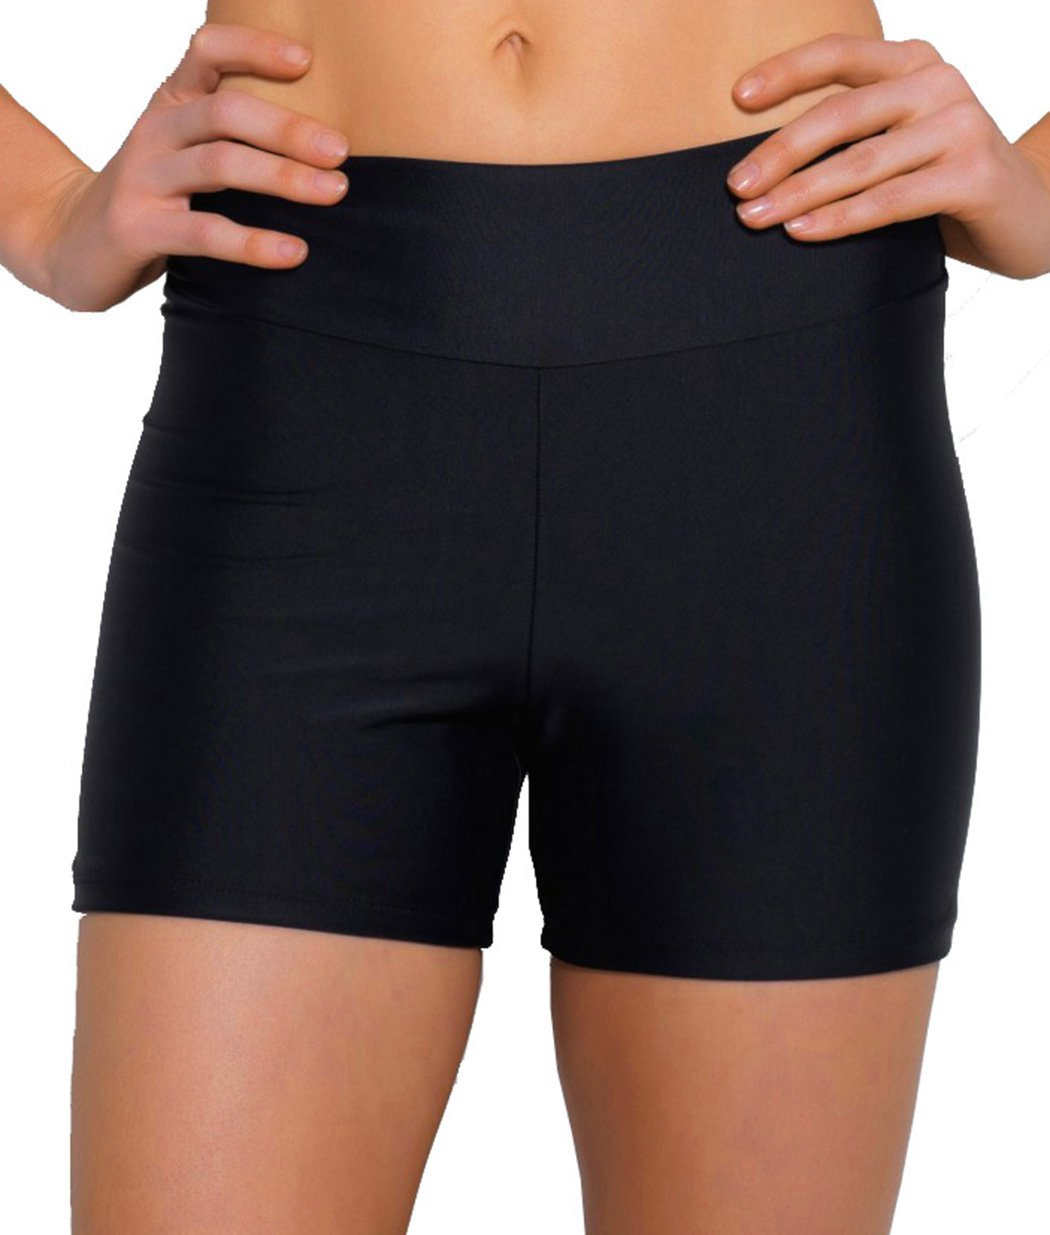 ebuddy Women Summer Swimwear Tummy Tuk Swim Bottom Shorts,Boyleg-black,US10 (Tag L)